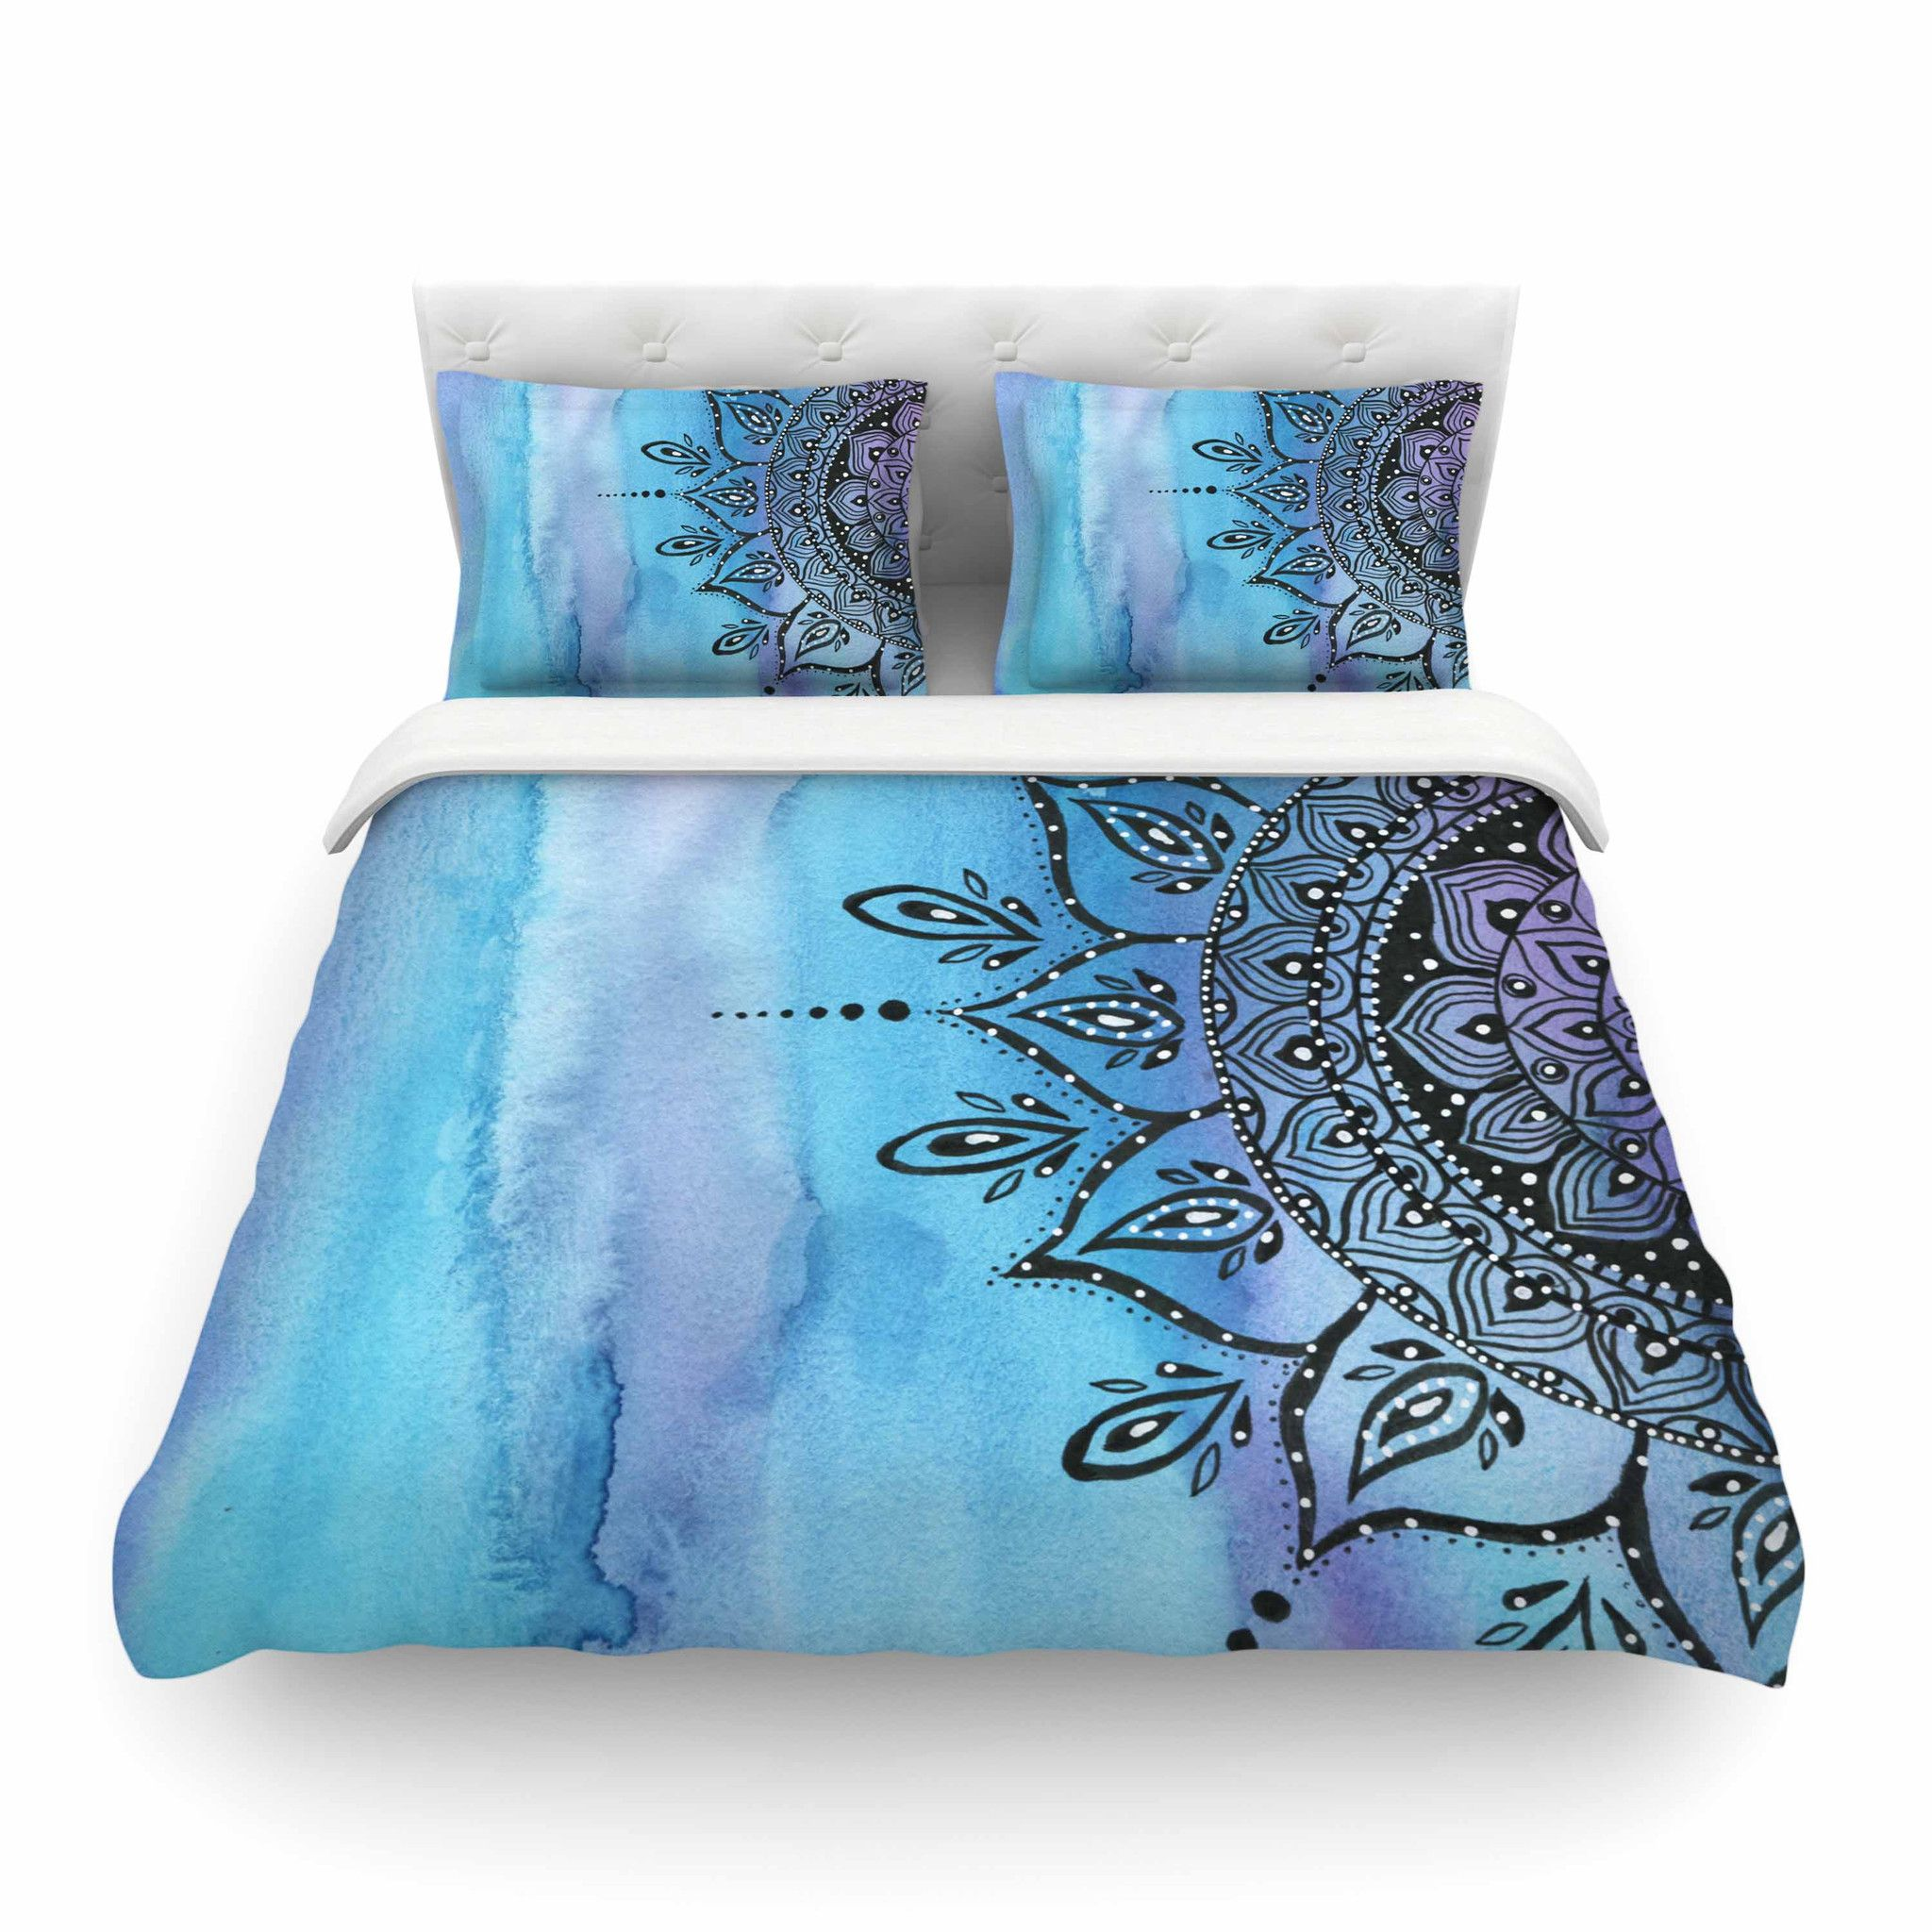 30 x 20 Pillow Sham Kess InHouse Malia Shields Blues Abstract Series 1 Green Teal